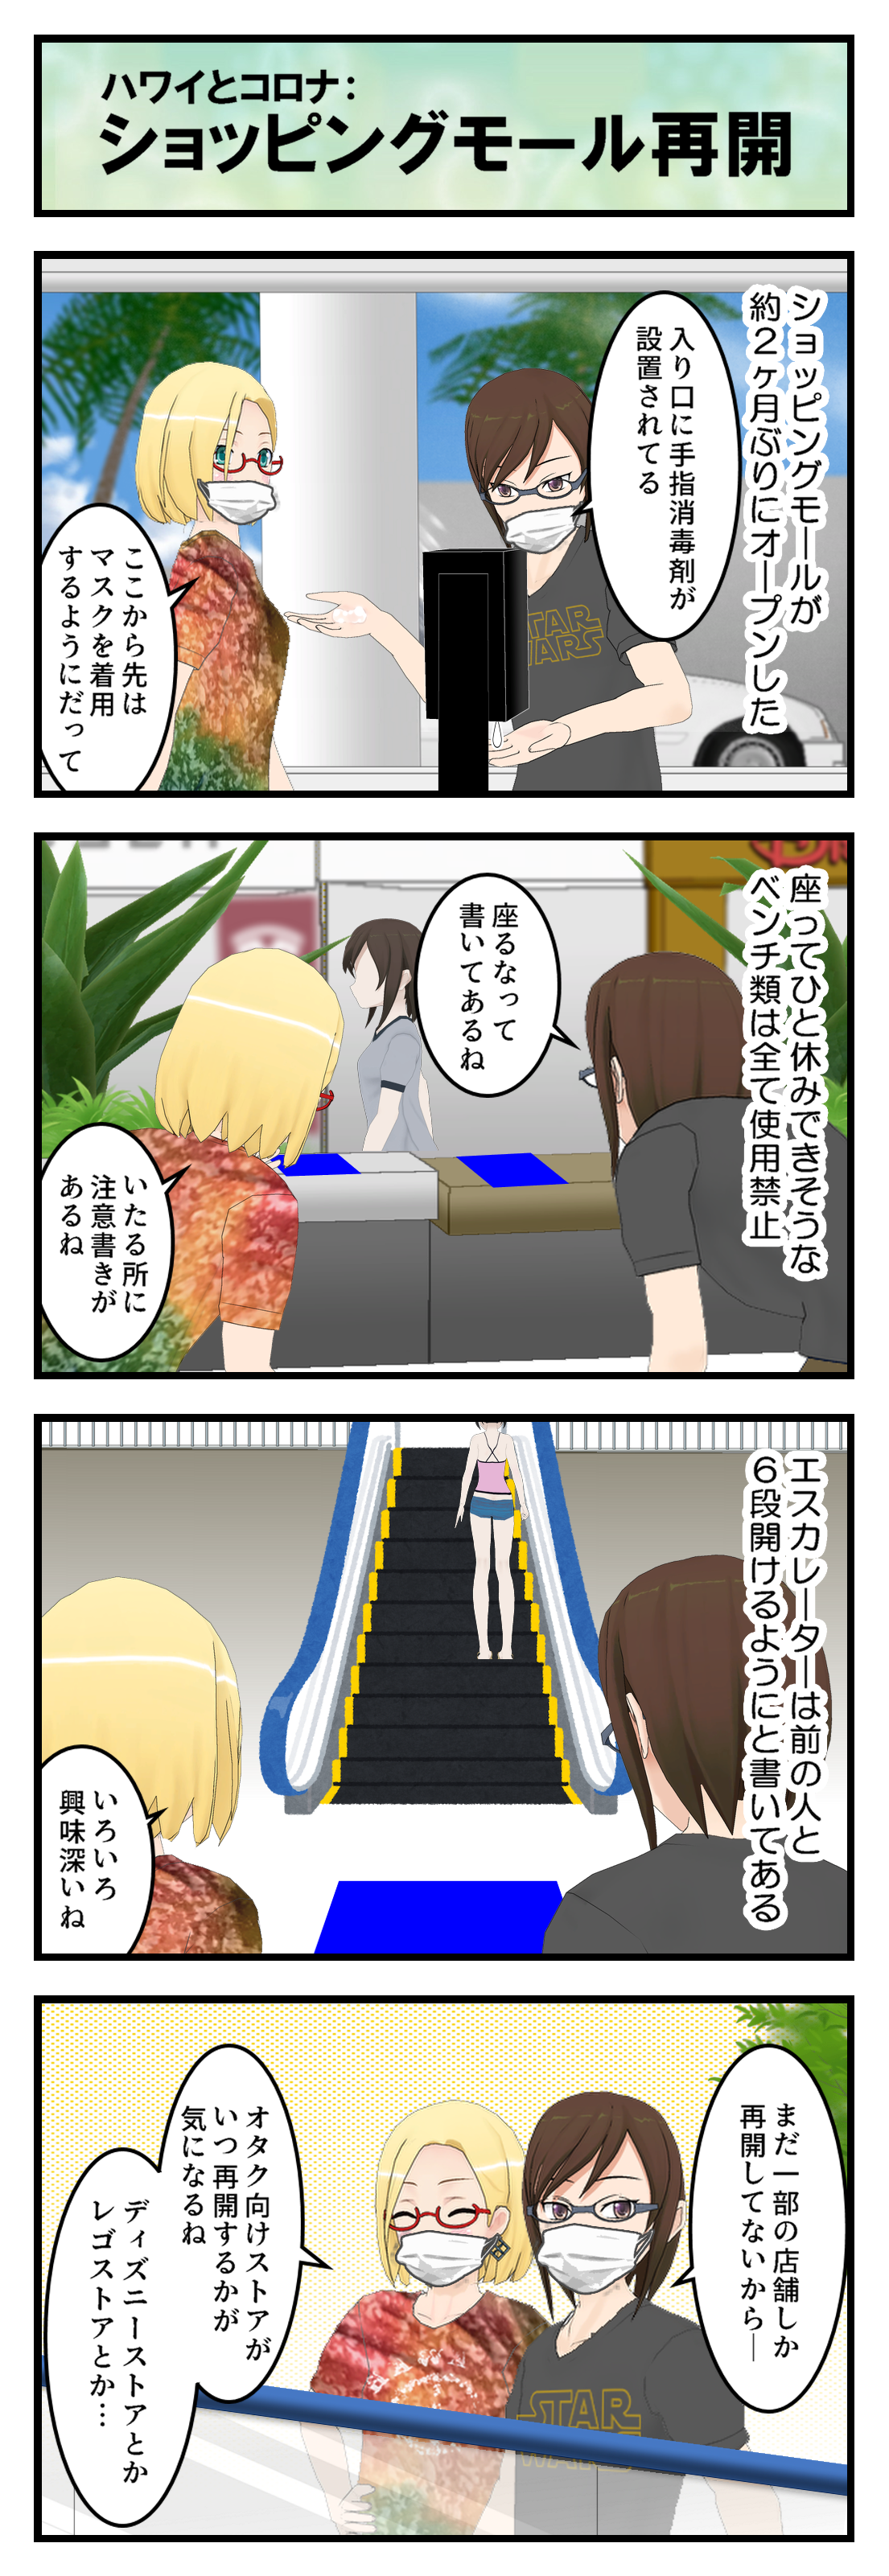 R662_ショッピングモール再開_001